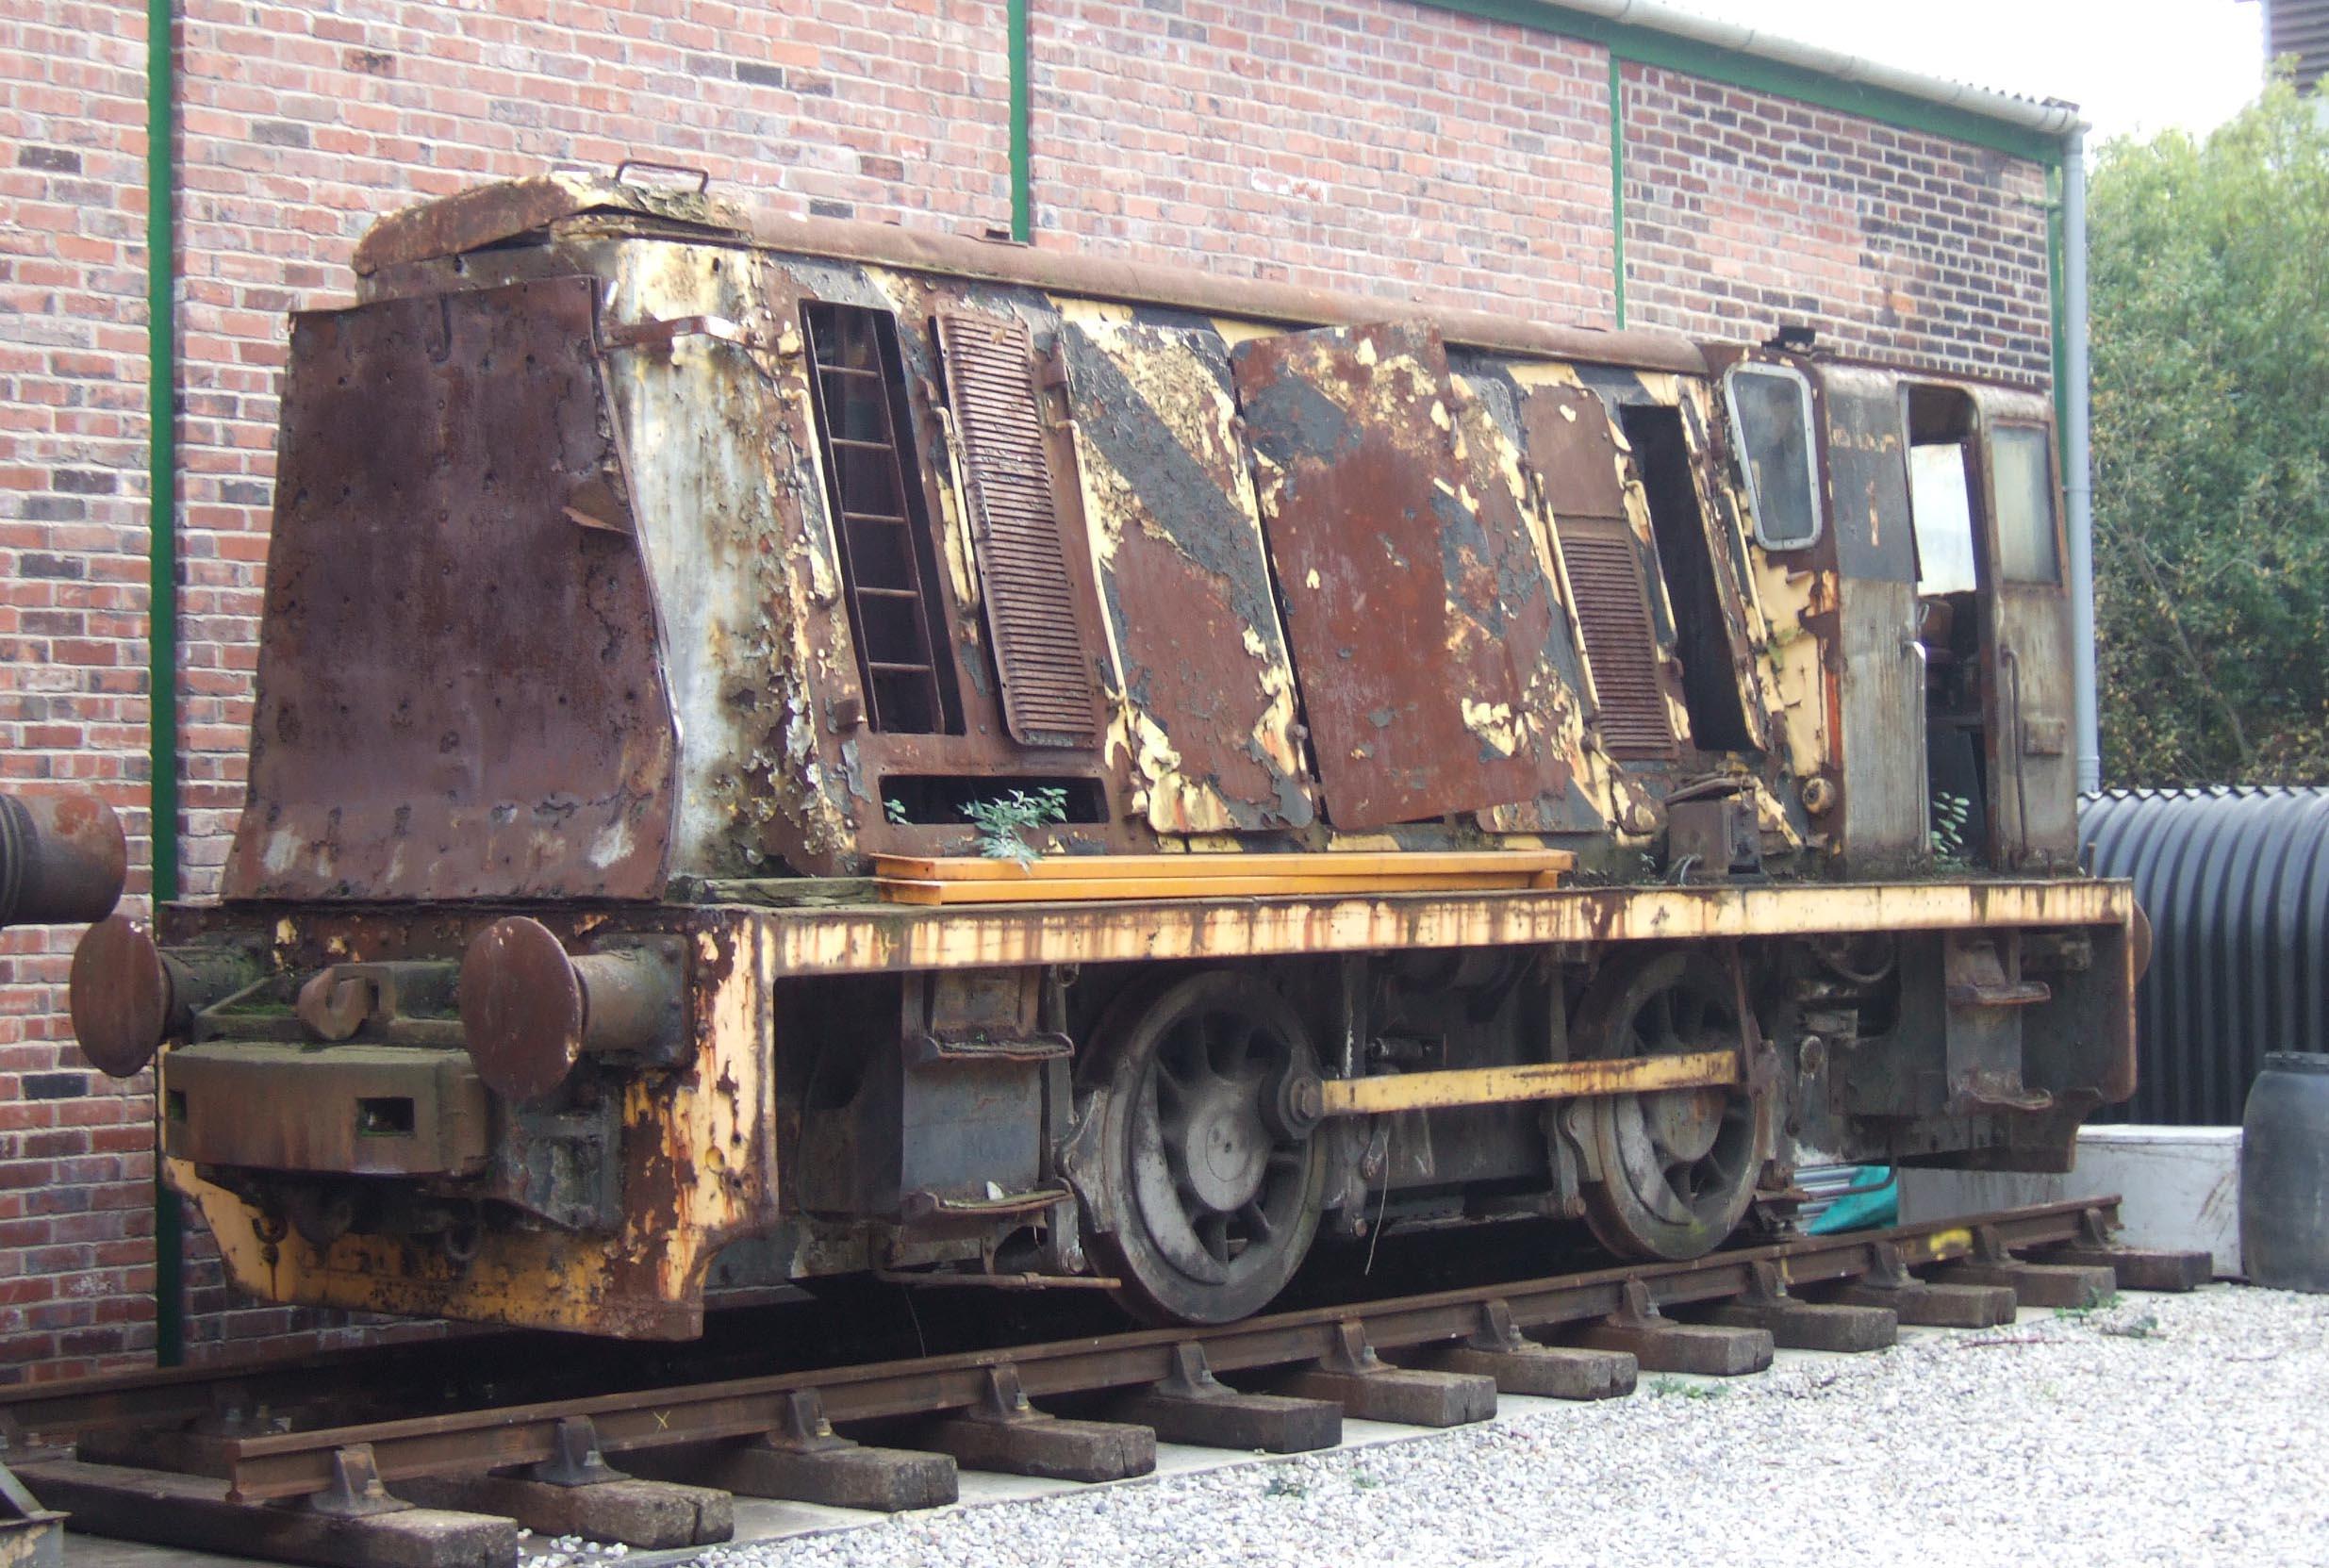 File:Yorkshire Engine 2481 05-10-16 30.jpeg